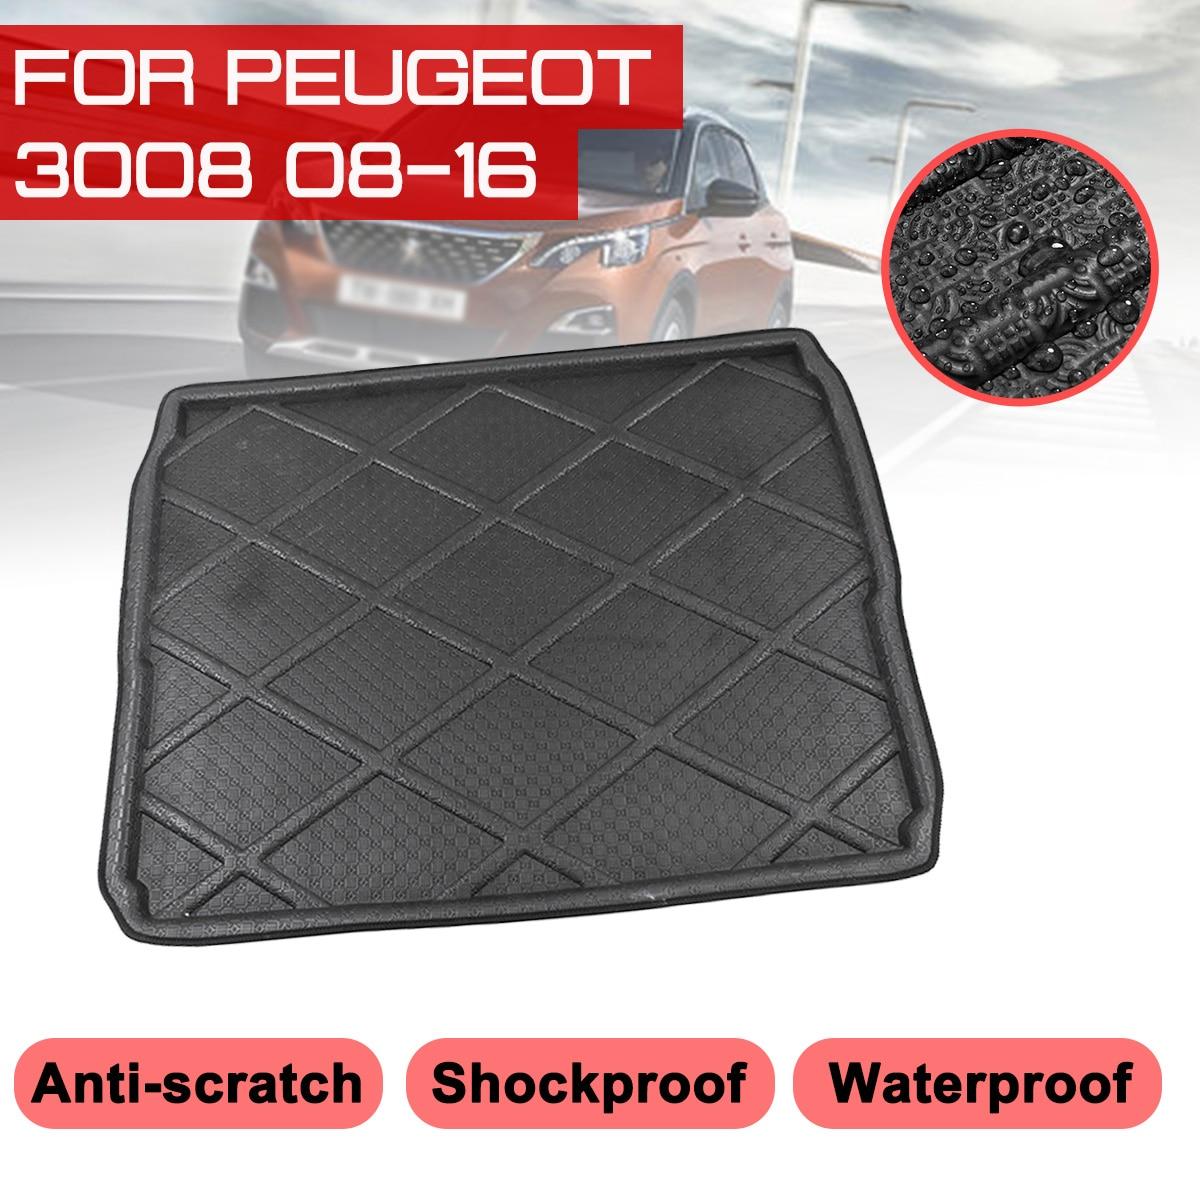 Car Rear Trunk Boot Mat For Peugeot 3008 2008-2016 Waterproof Floor Mats Carpet Anti Mud Tray Cargo Liner